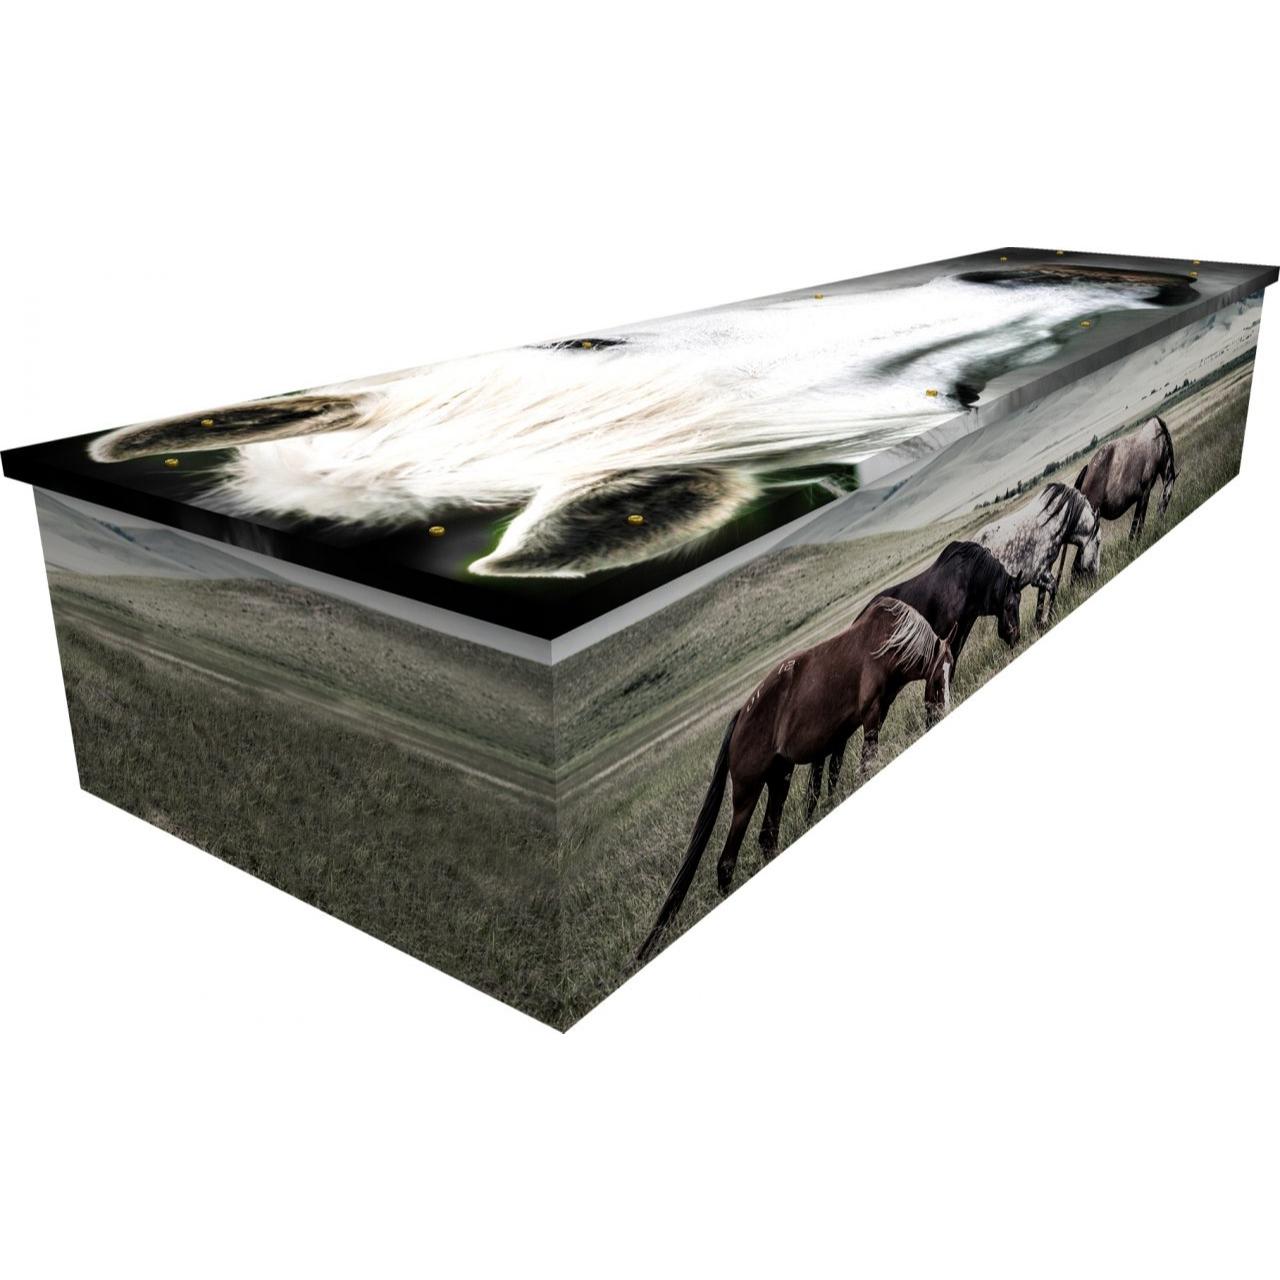 Horse Cardboard Coffin